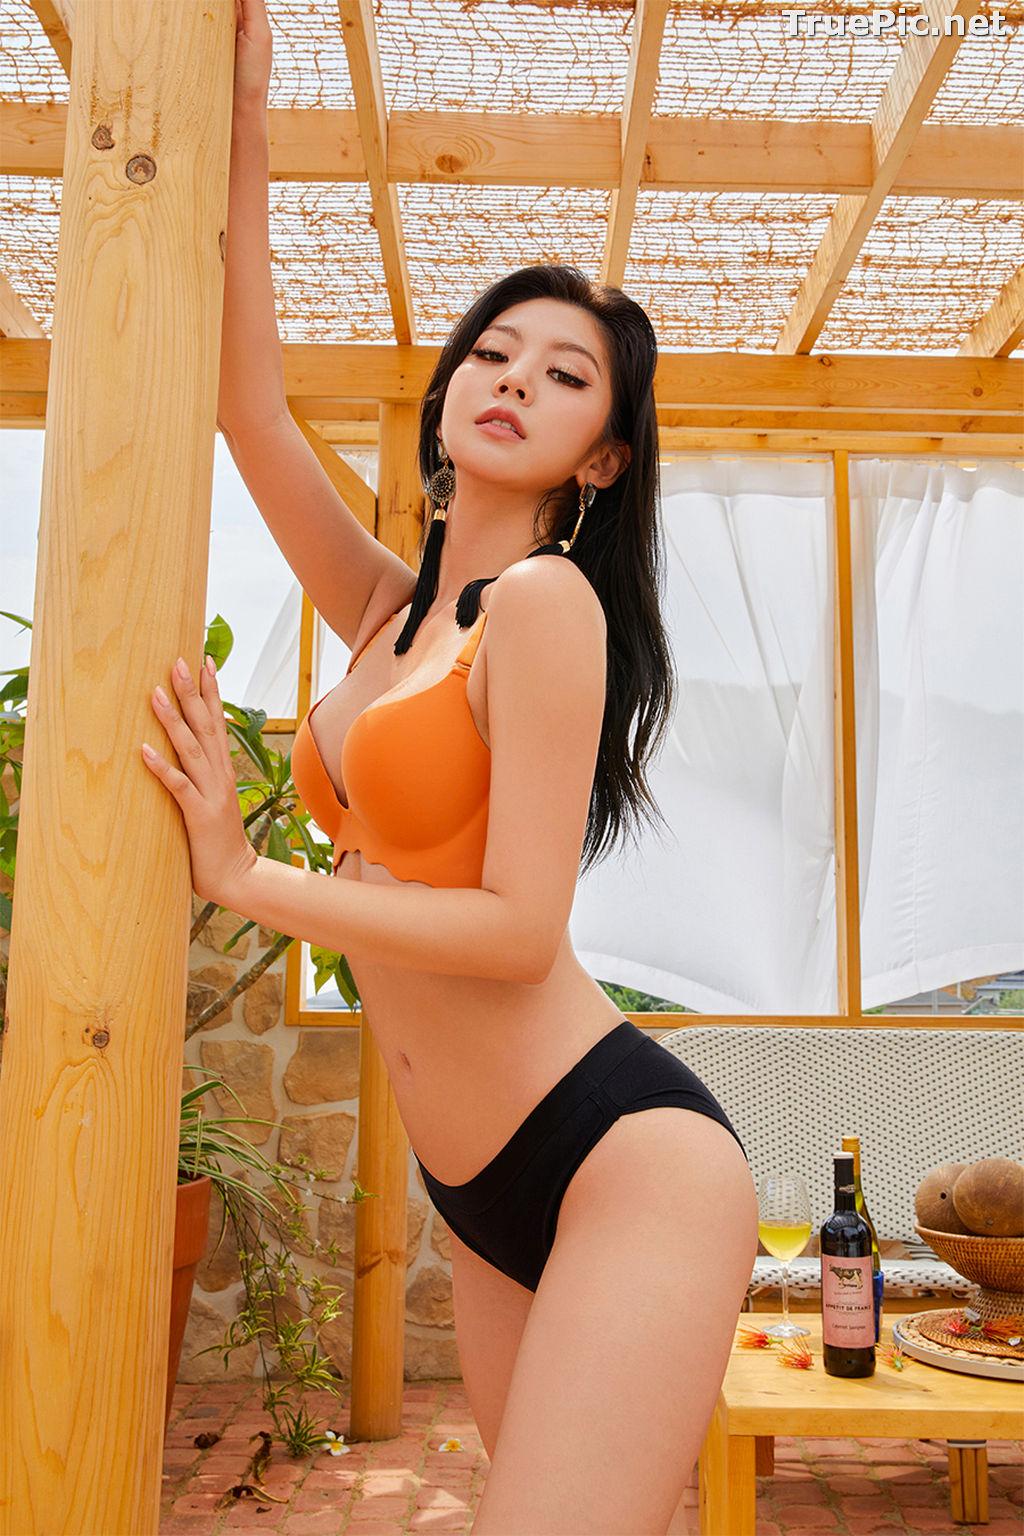 Image Korean Fashion Model – Lee Chae Eun (이채은) – Come On Vincent Lingerie #6 - TruePic.net - Picture-10